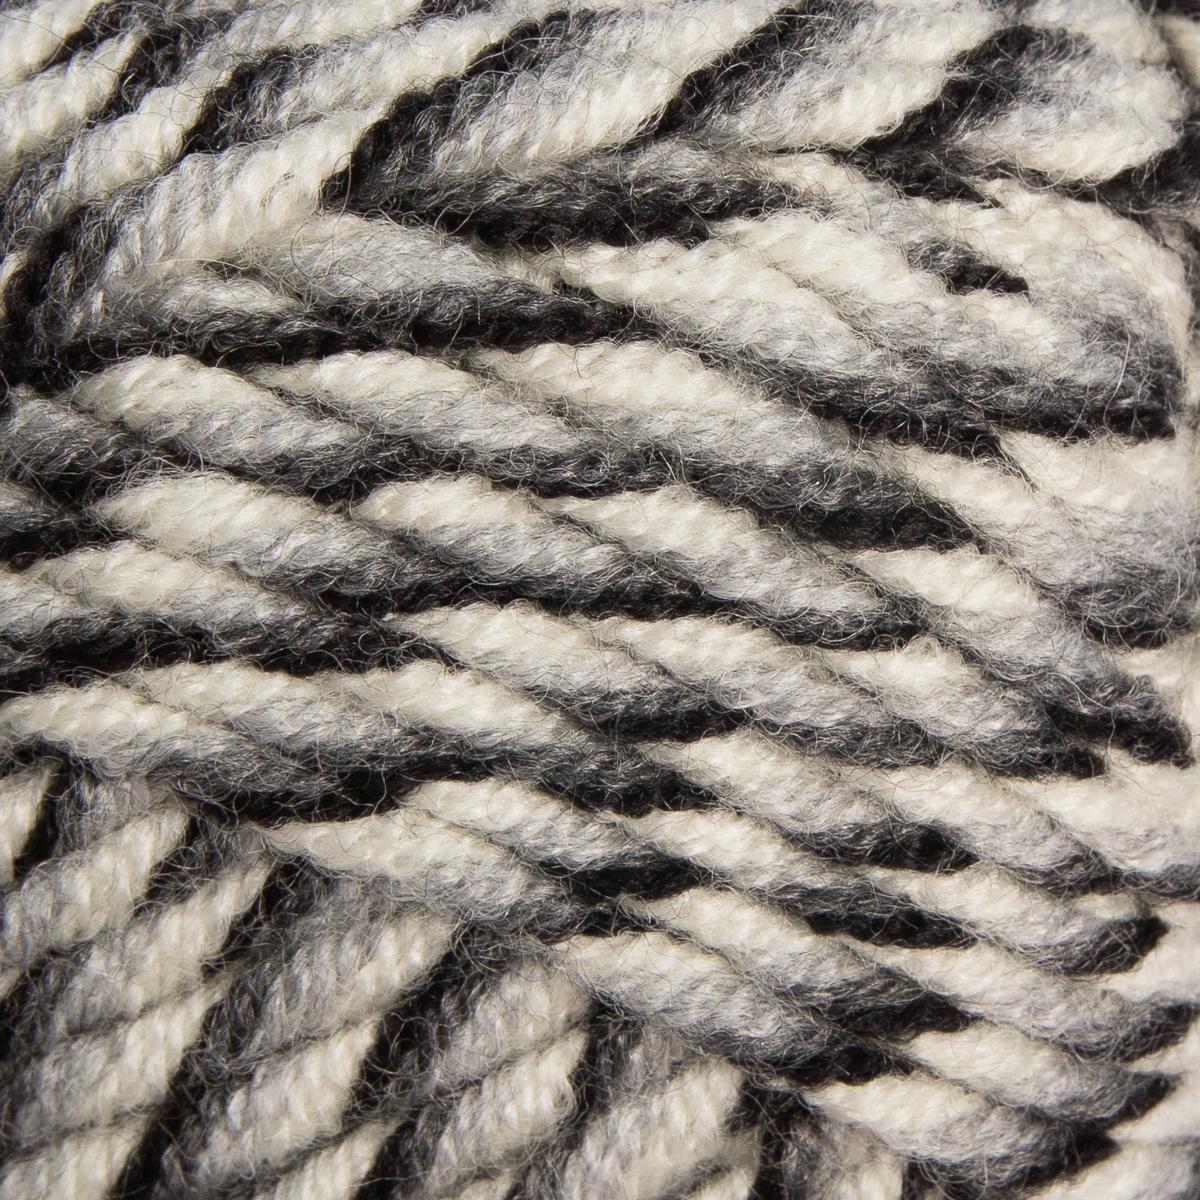 3pk-Lion-Brand-Woolspun-Acrylic-amp-Wool-Yarn-Bulky-5-Knit-Crocheting-Skeins-Soft thumbnail 103